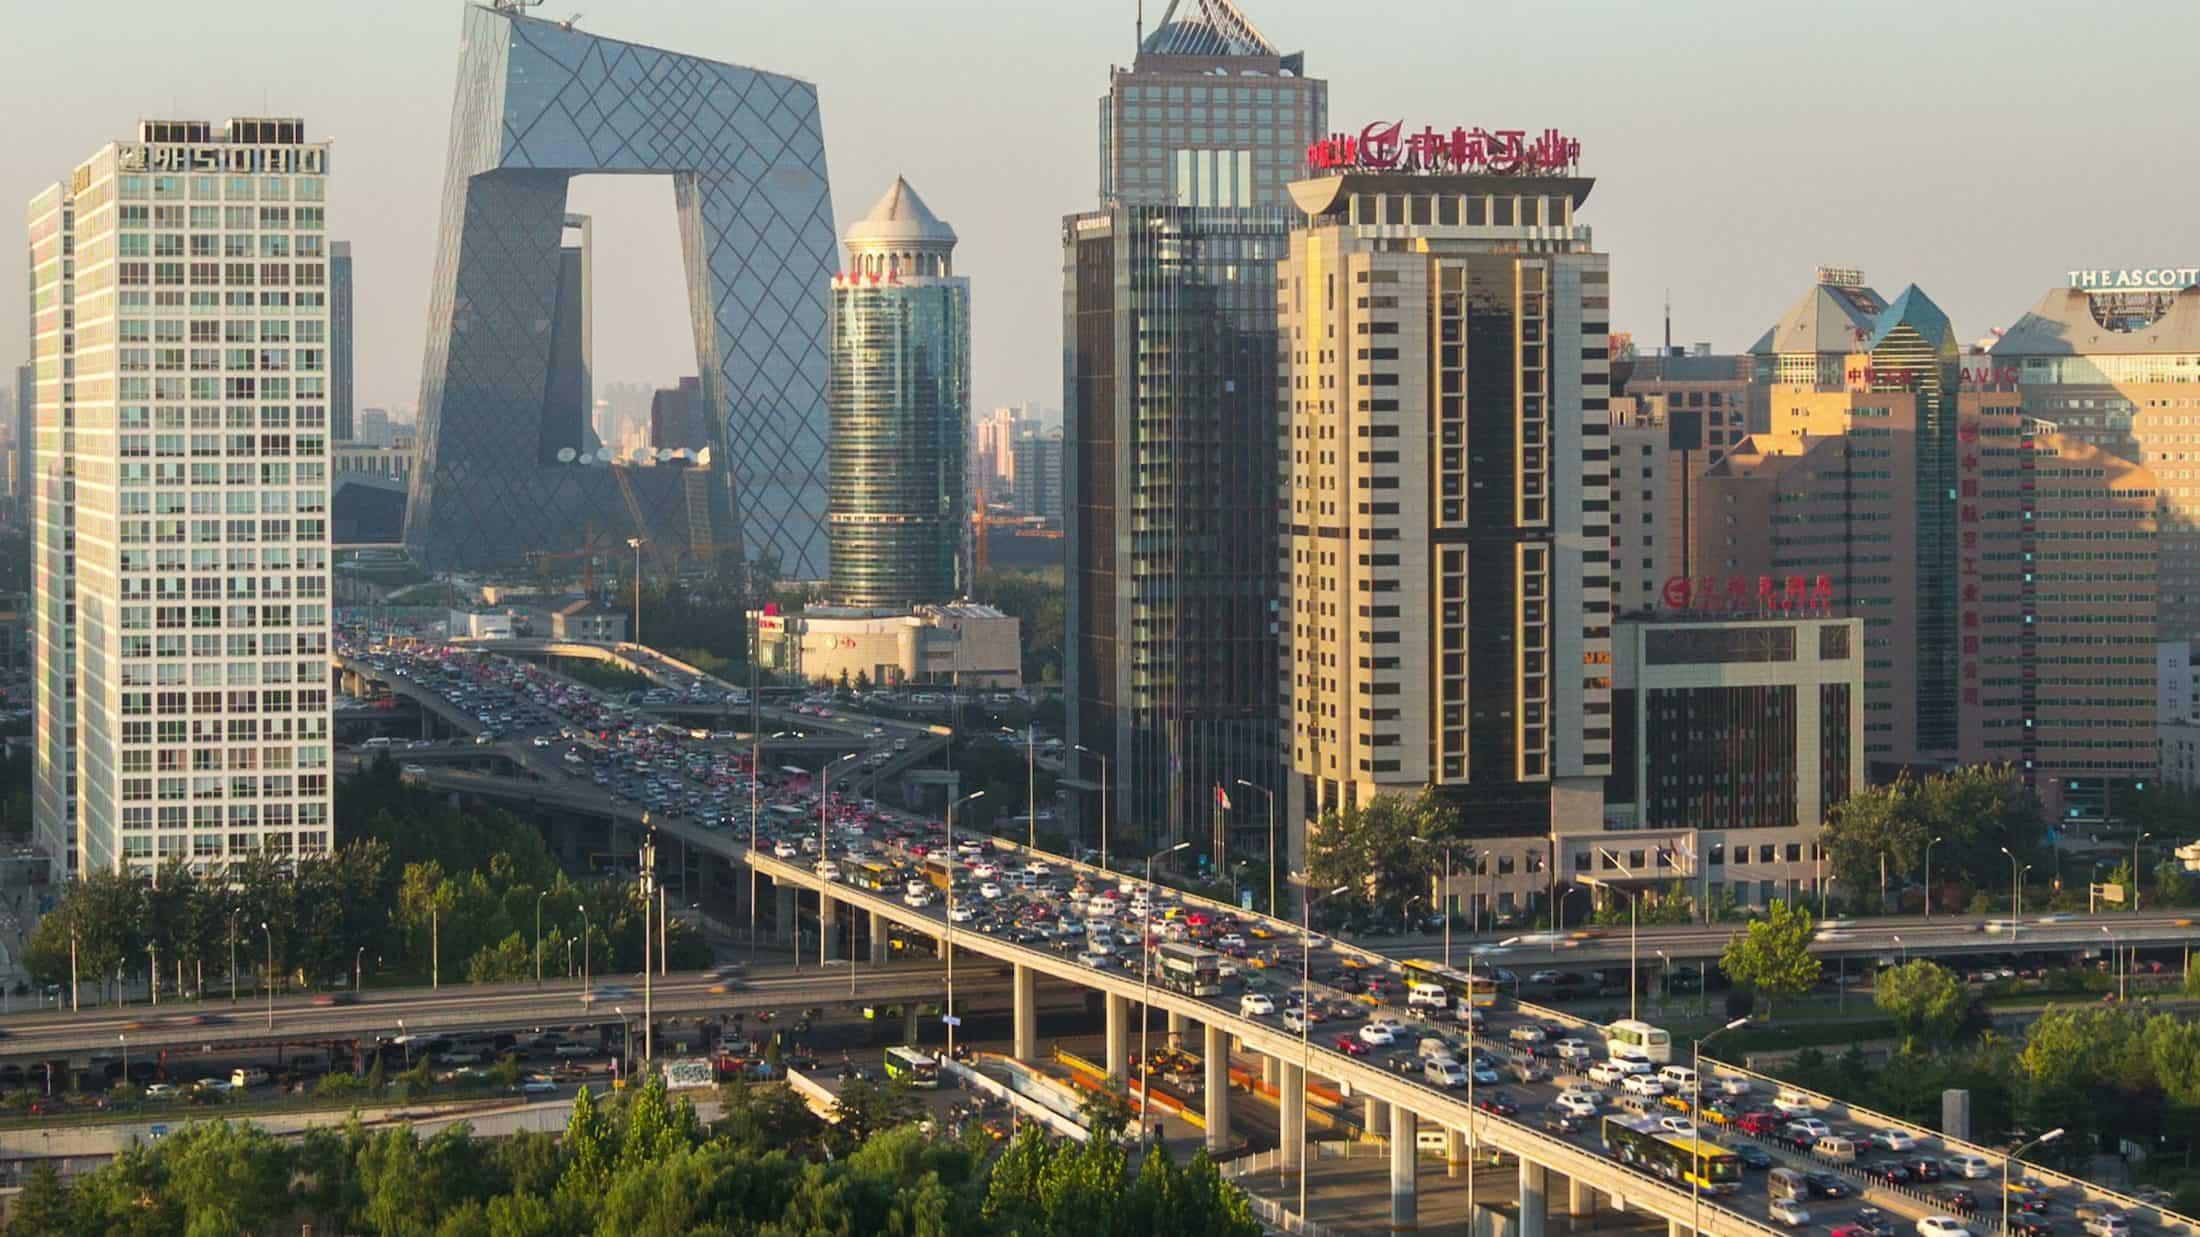 sursa imaginii http://grantist.com/grant/stipendialnaya-programma-pravitelstva-pekina/